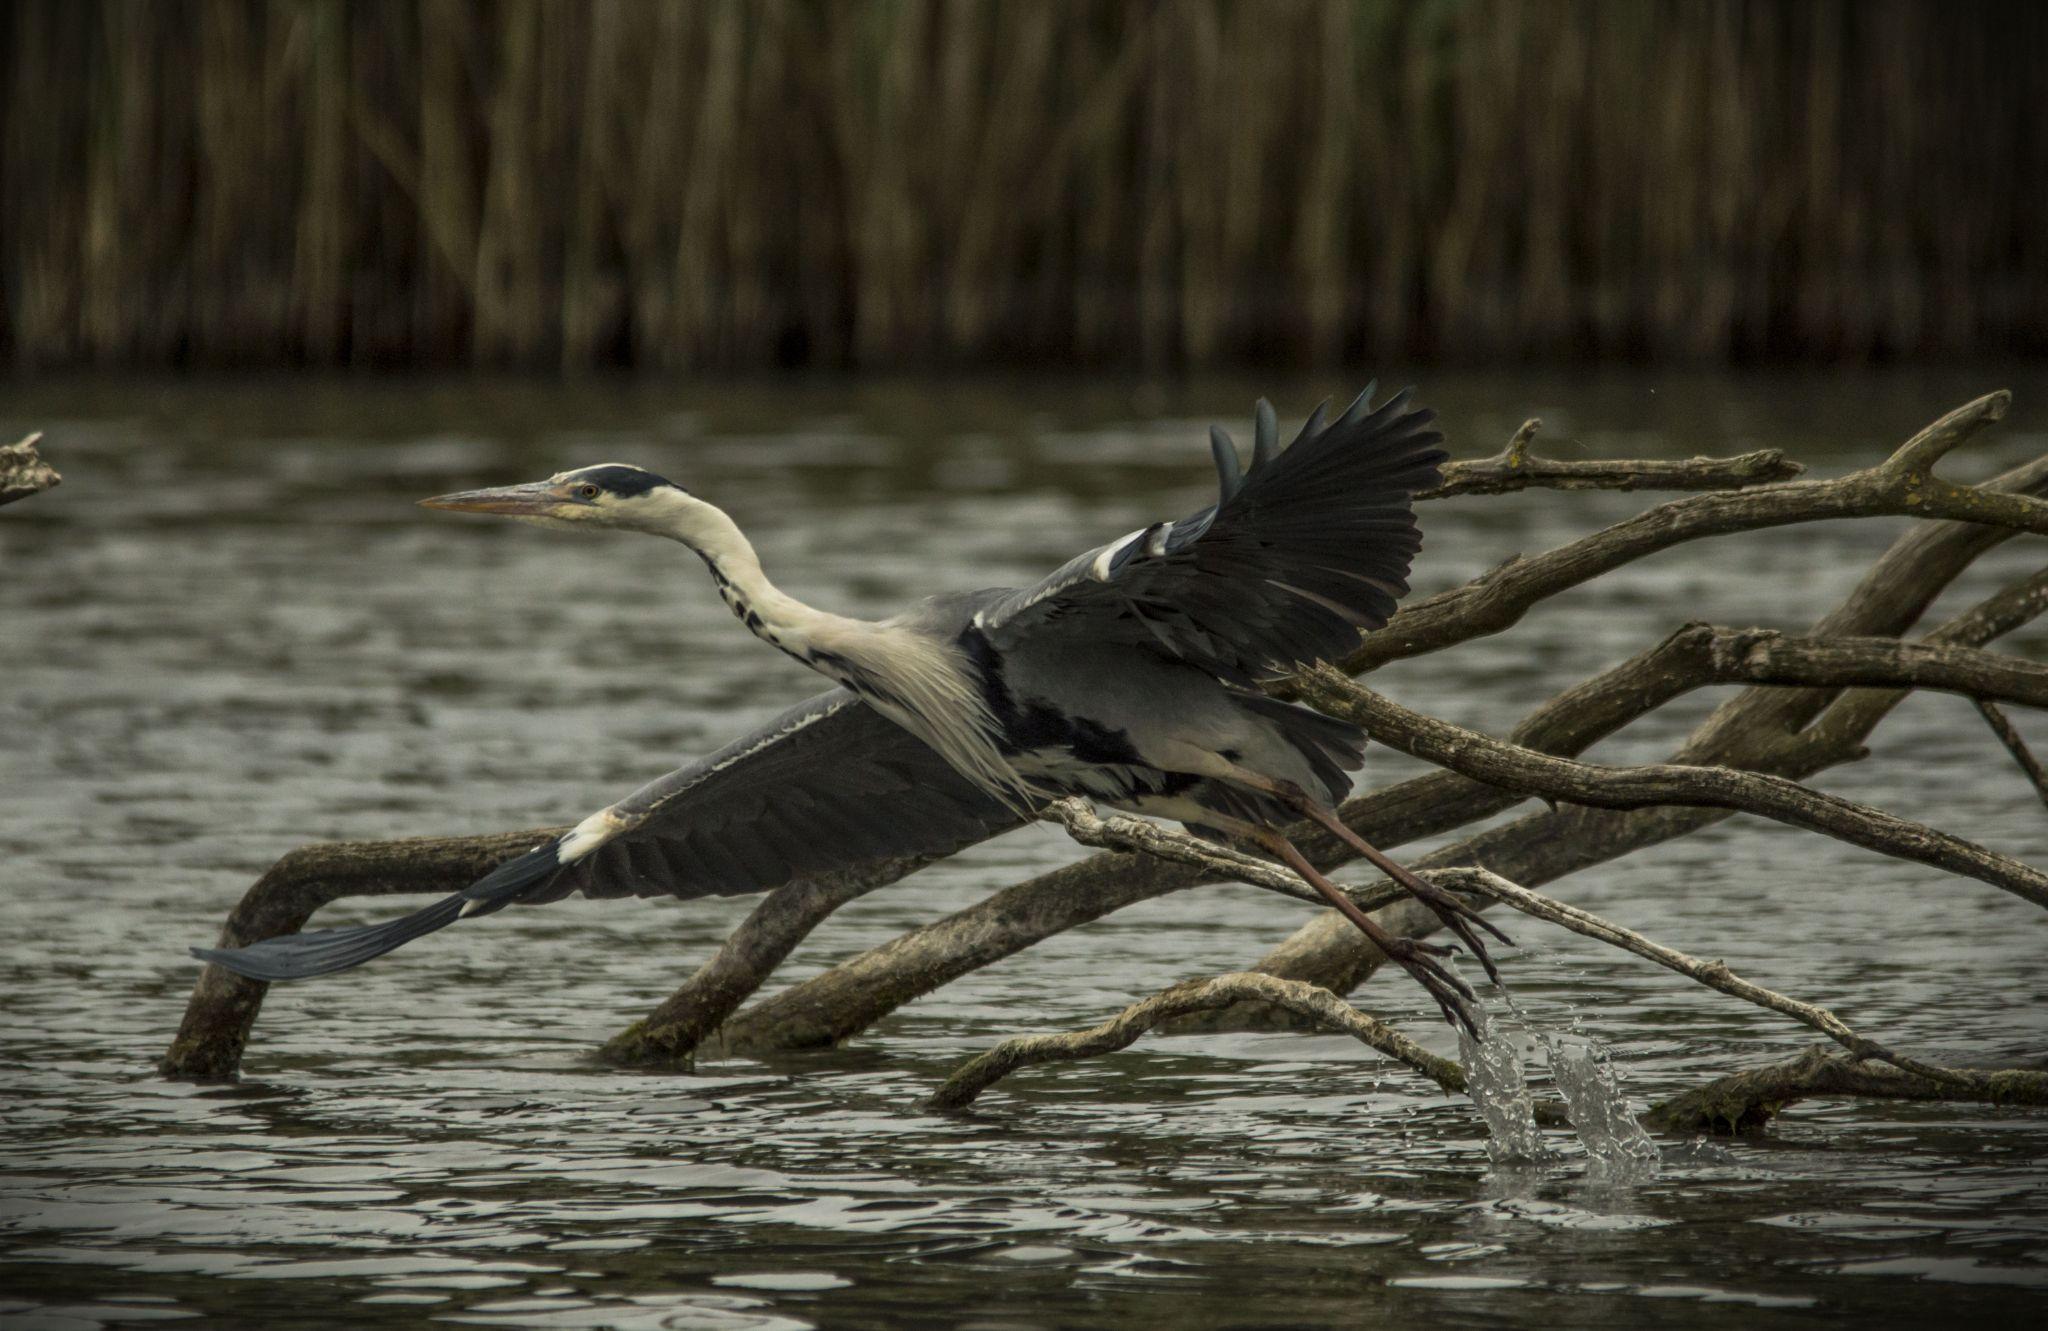 Grey Heron taking flight. by GarryWeeksPhotography